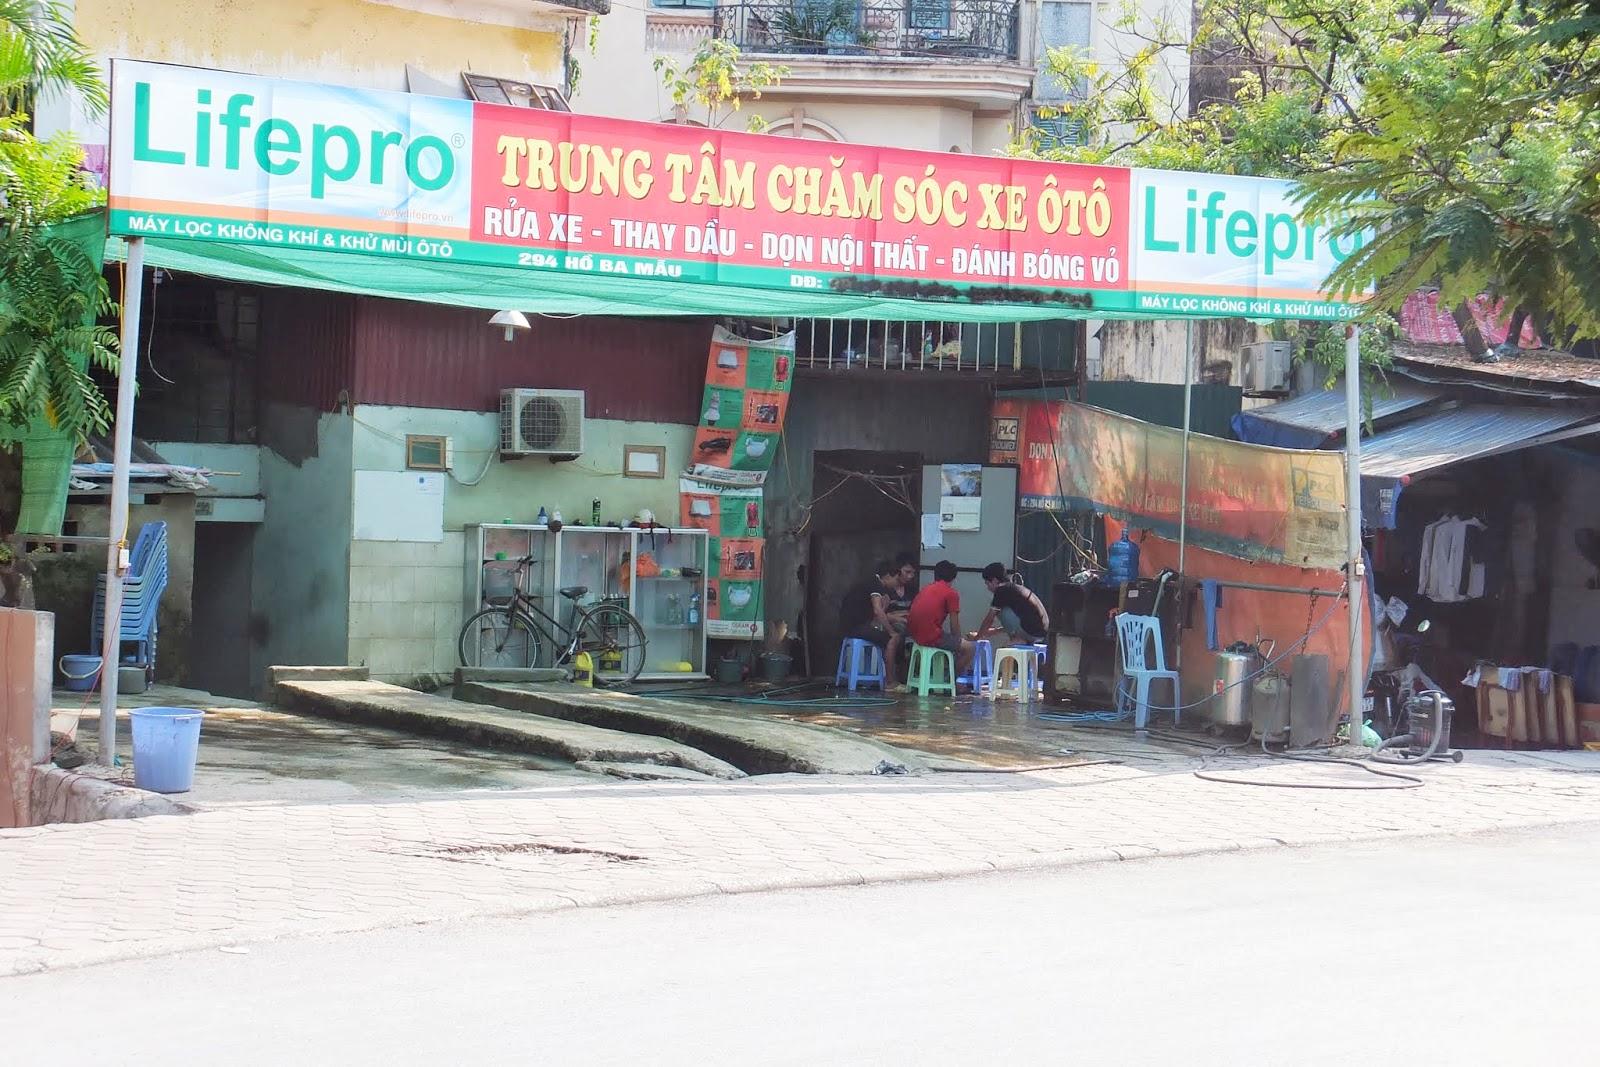 car-wash-shop-vietnam ベトナムの洗車屋